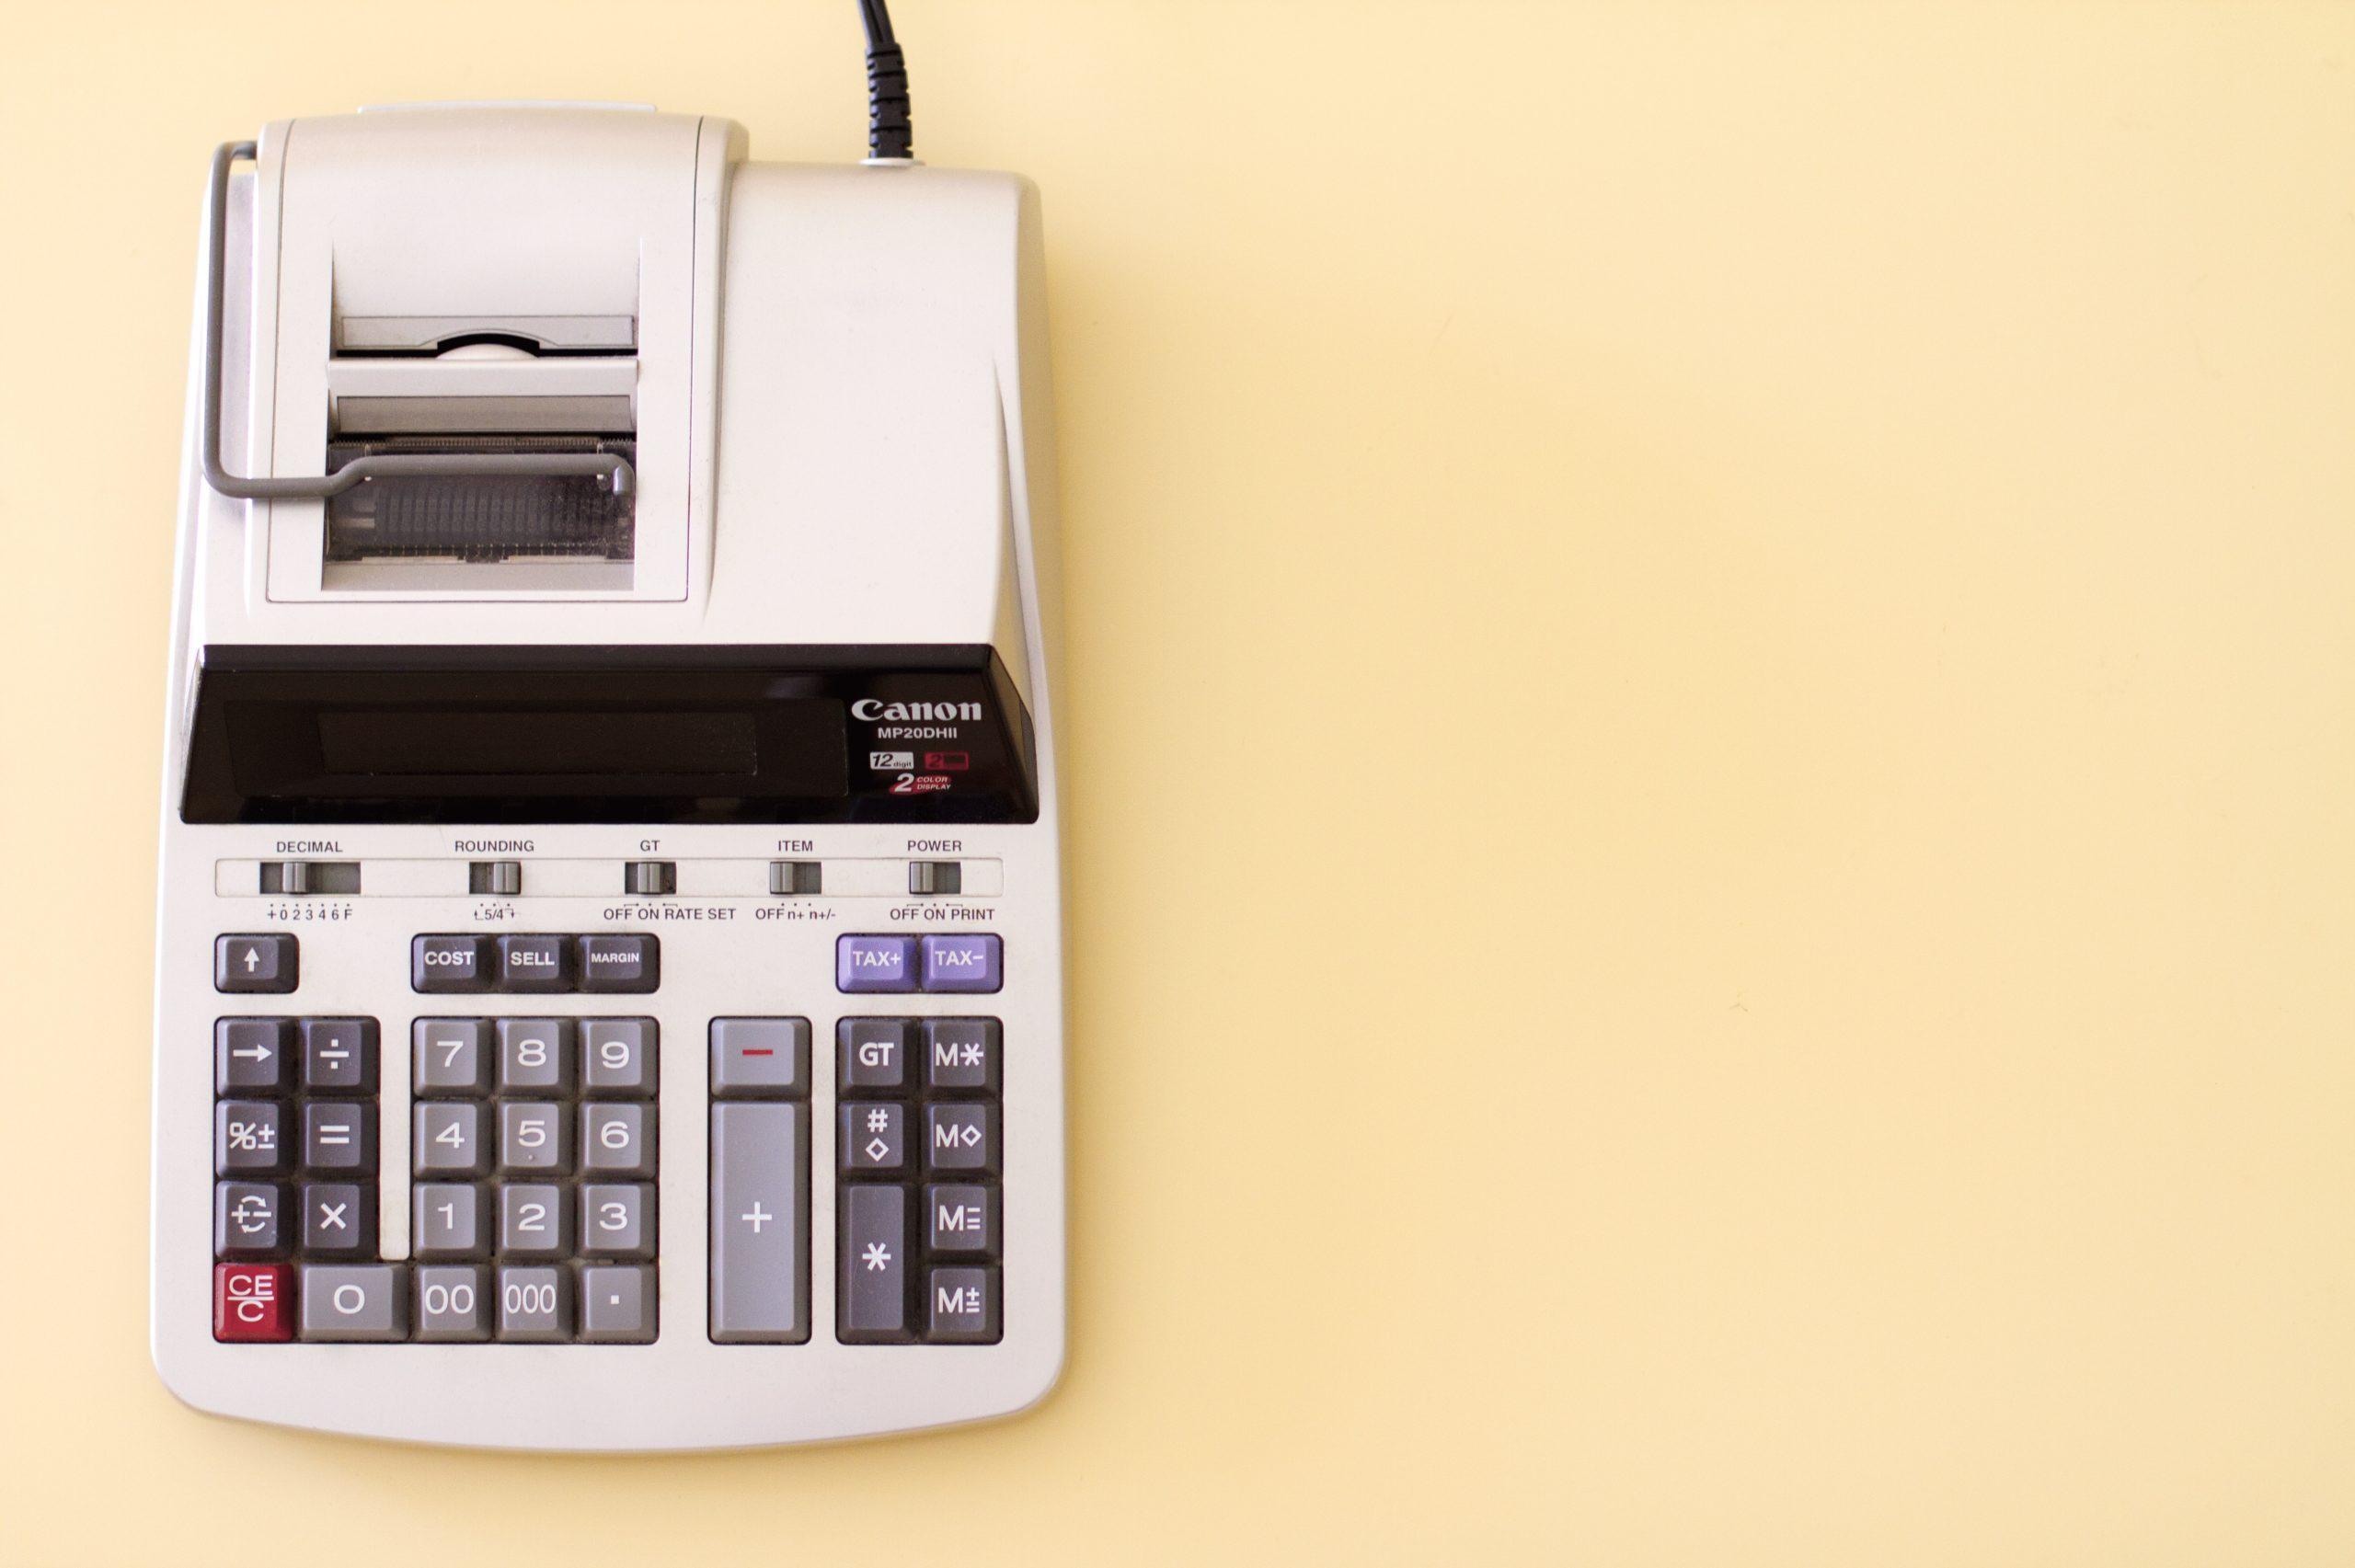 Second home mortgage calculator